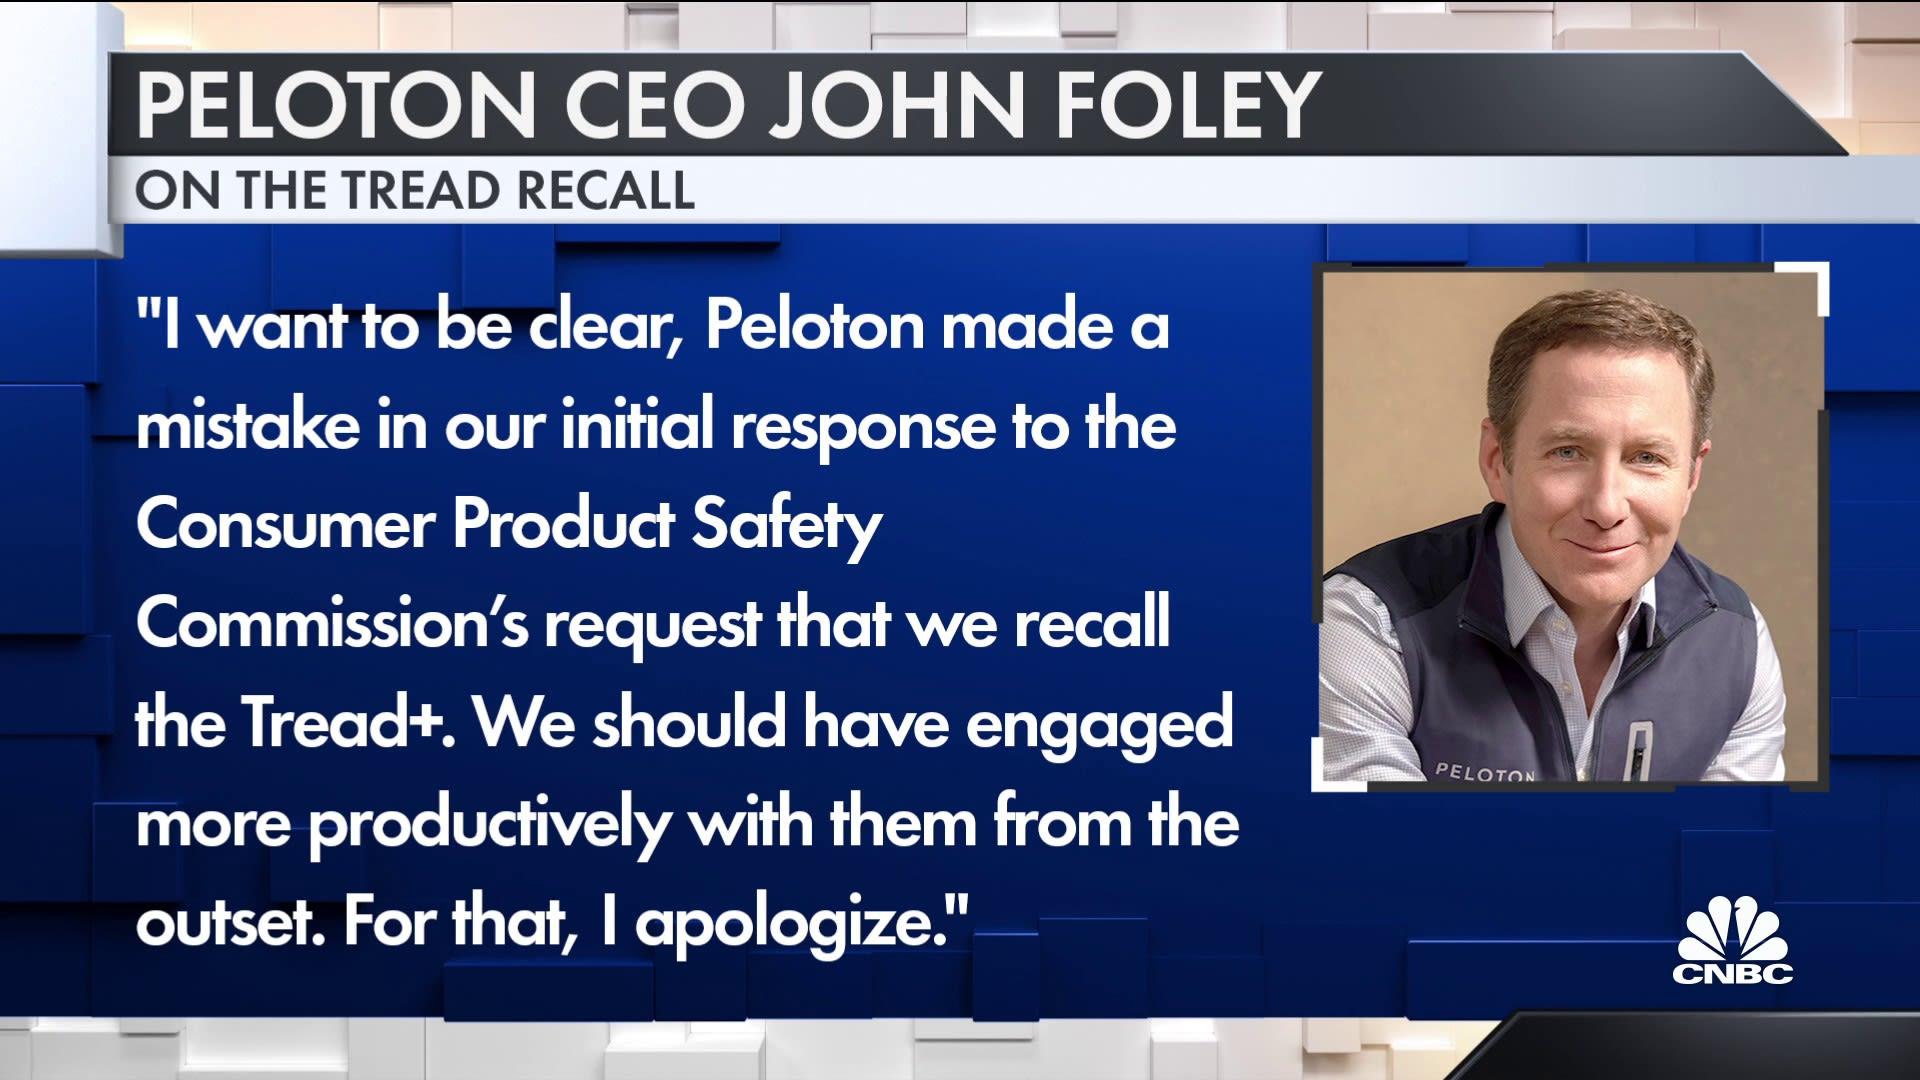 Words by Peloton CEO John Foley